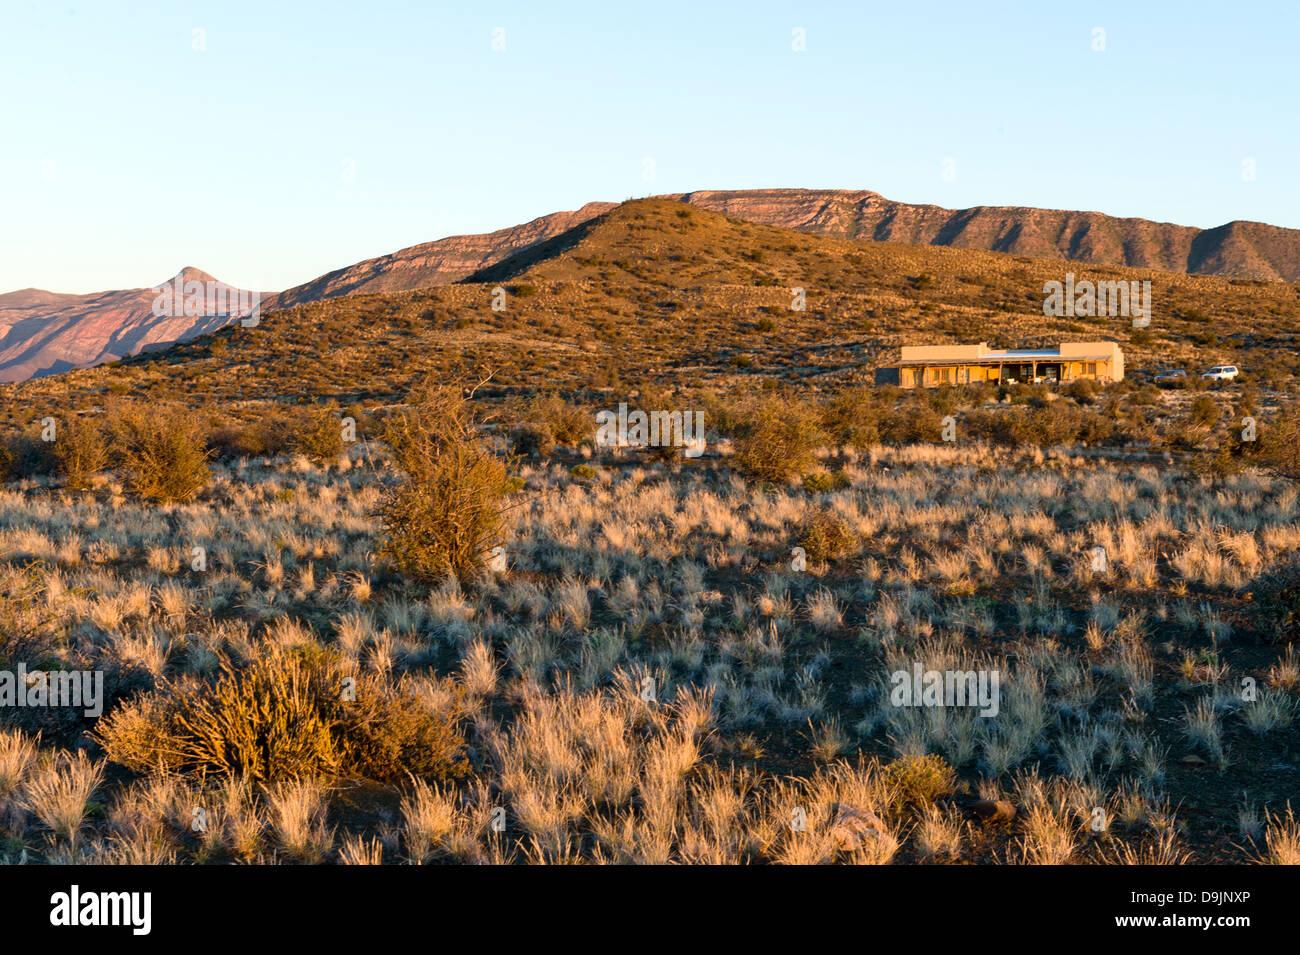 Karoo vegetation and lodge, Prince Albert, Western Cape, South Africa Stock Photo